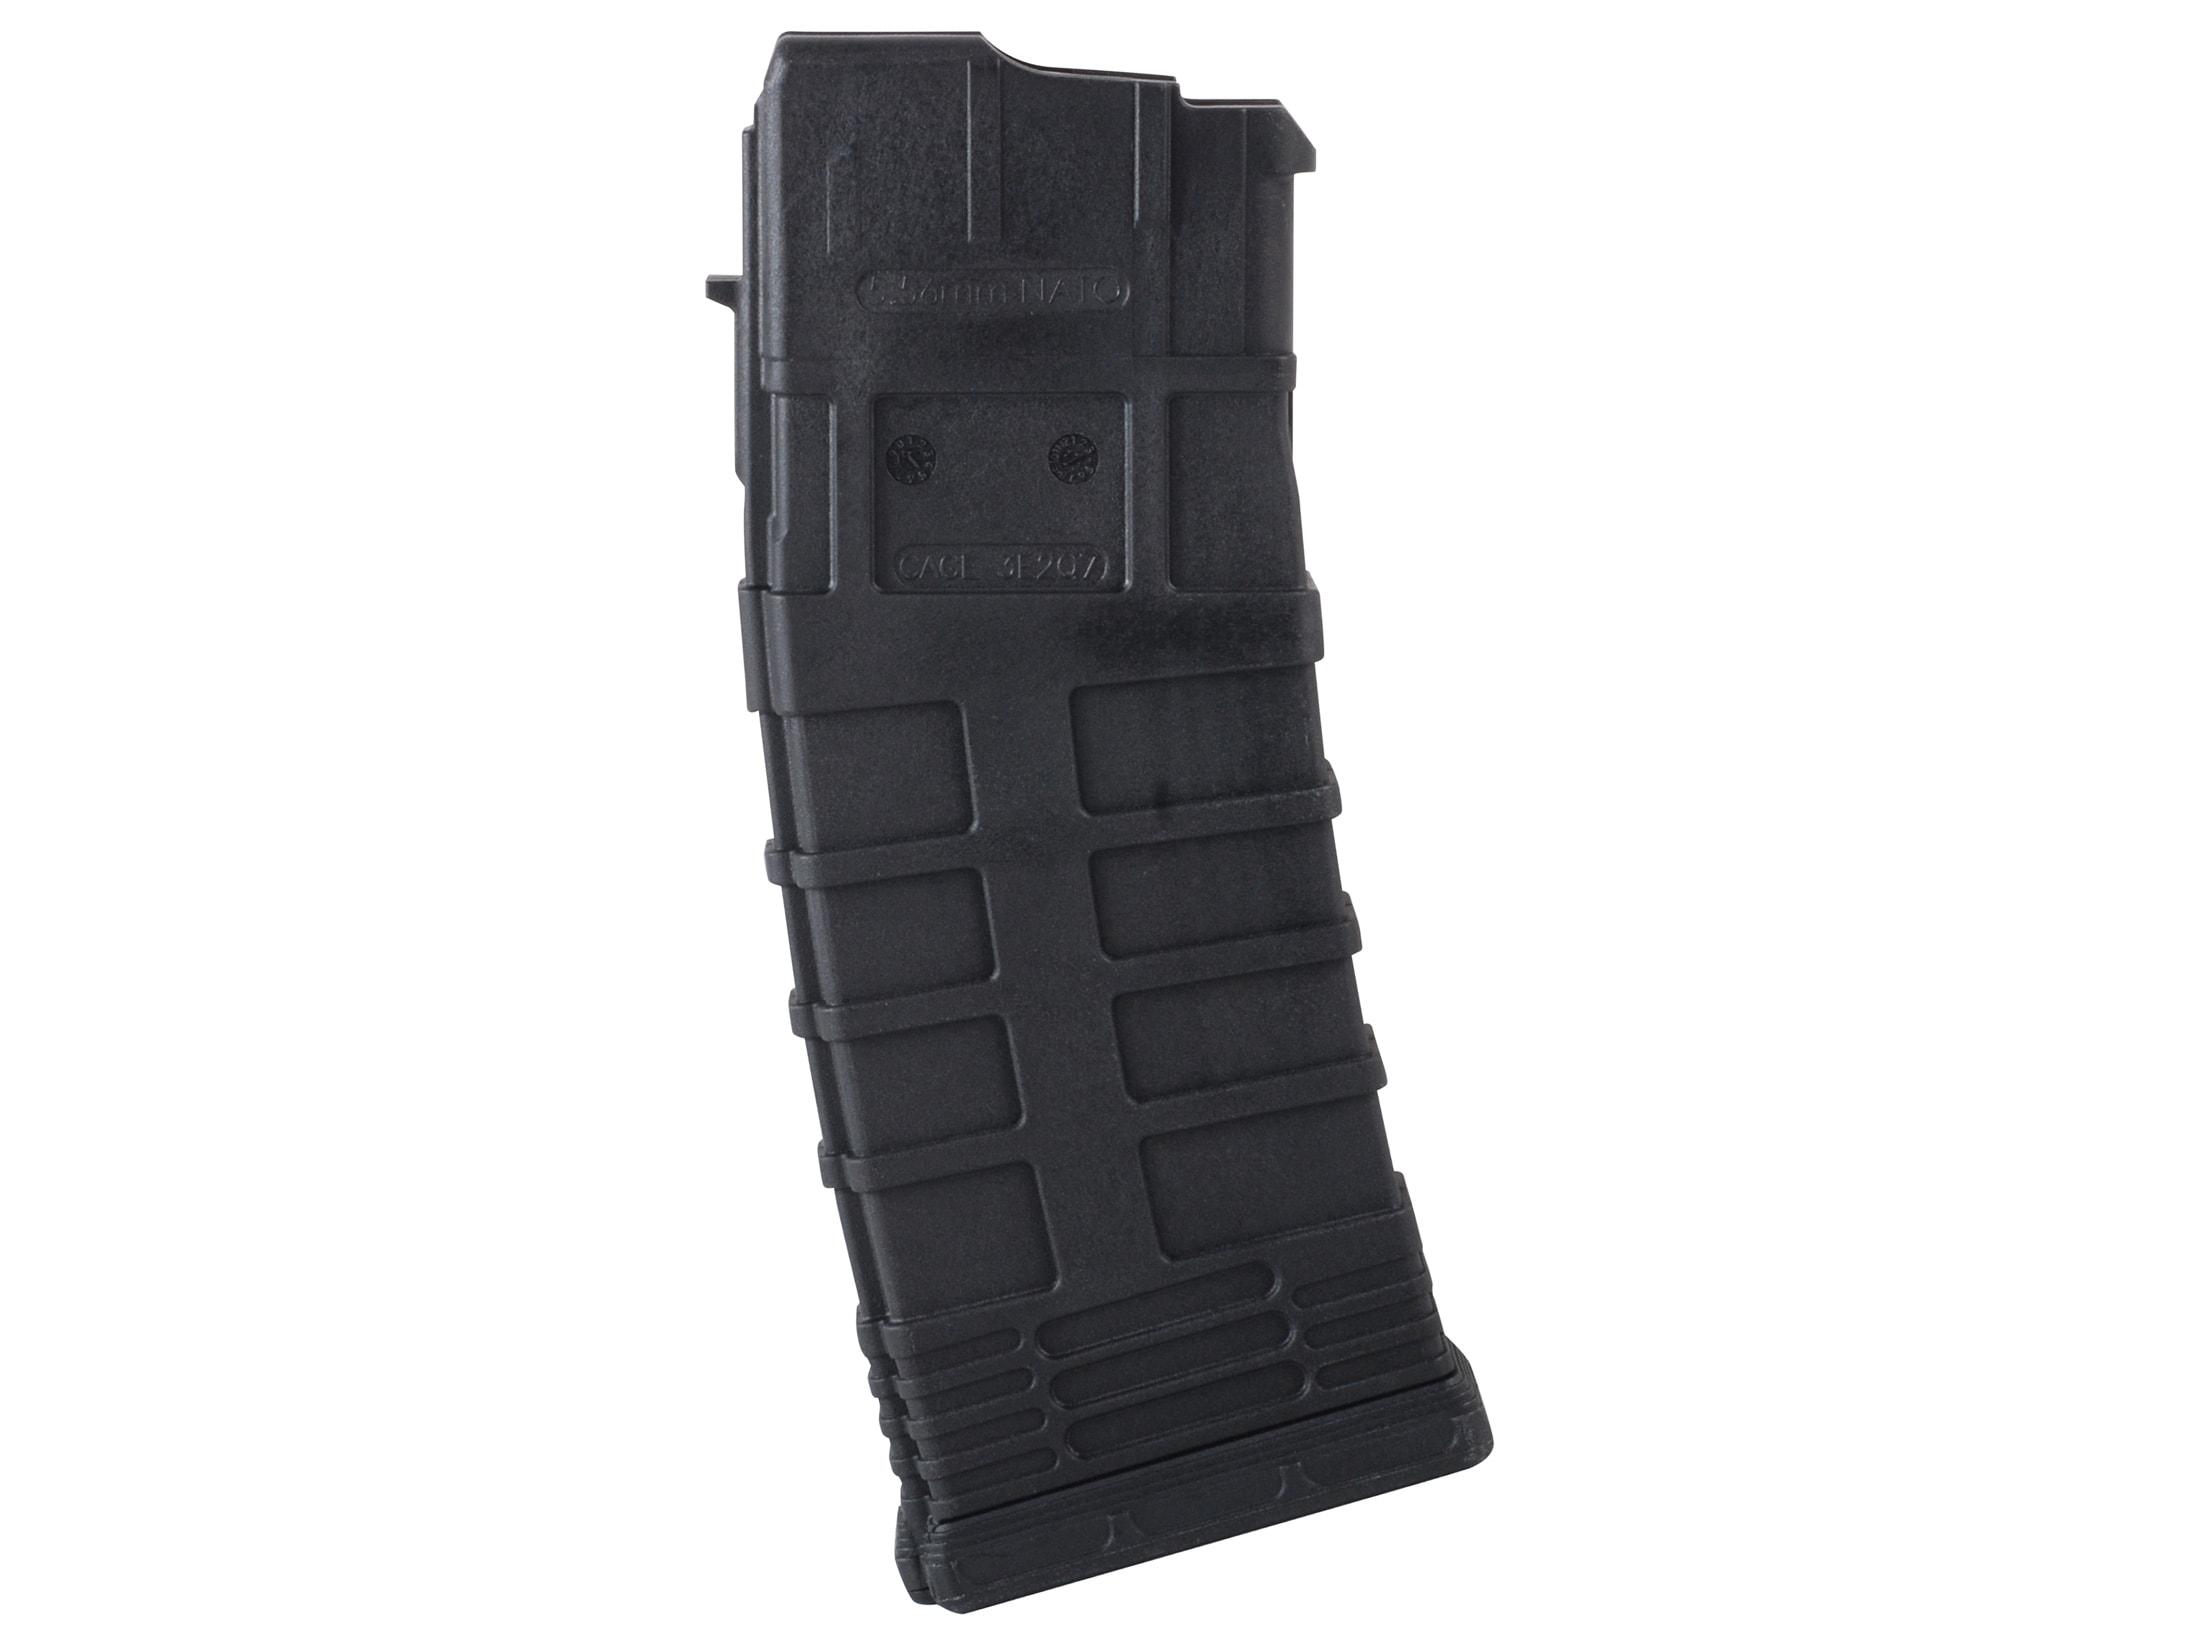 TAPCO Mag Galil Century Golani Sporter 223 Remington 5 56x45mm